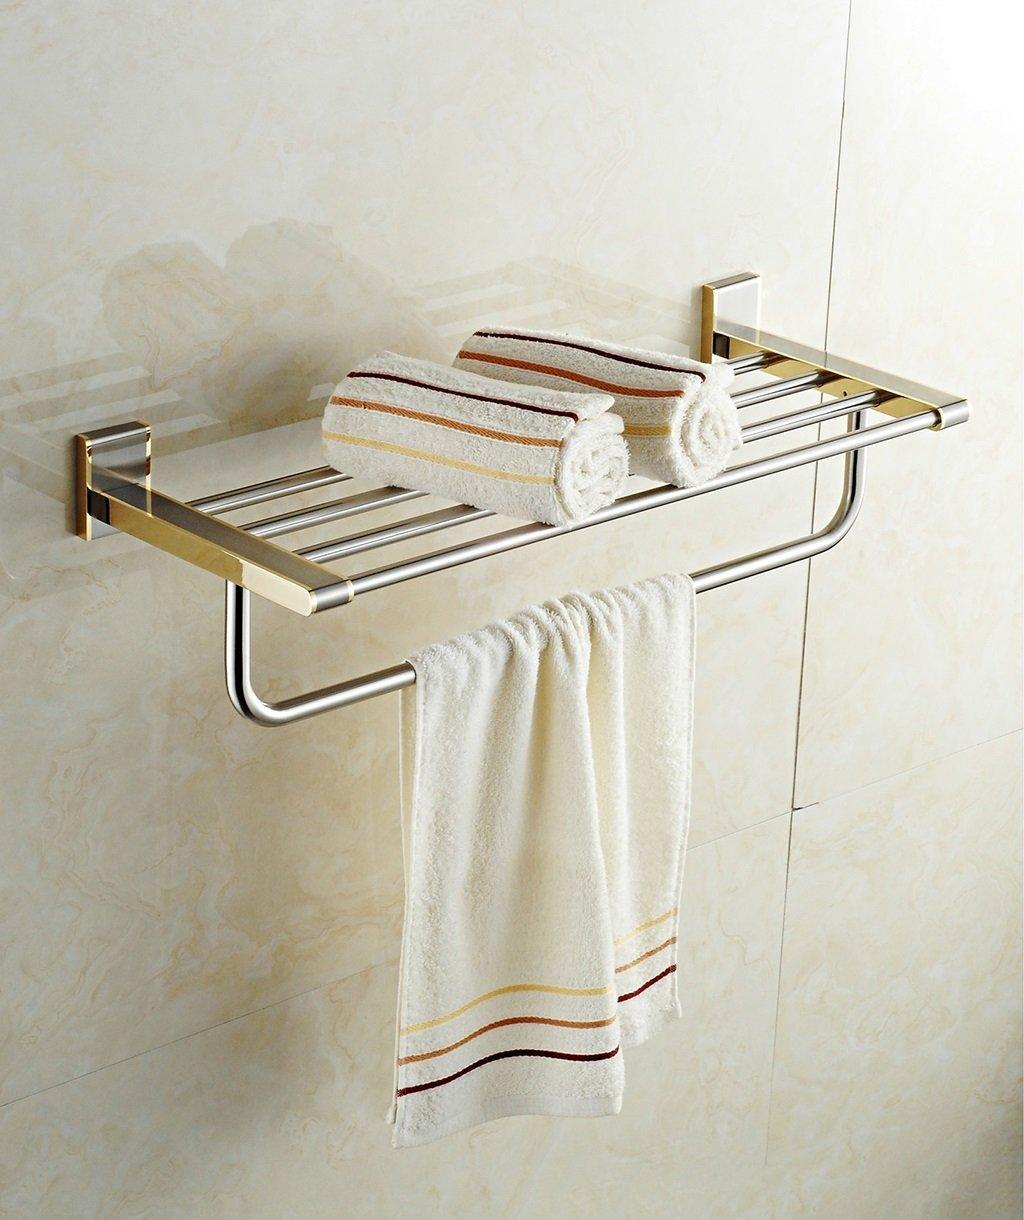 ZHAS Stainless Steel Gold Bathroom Towel Rack Luxury Bathroom Accessories Towel Rack (Color : Chrome)